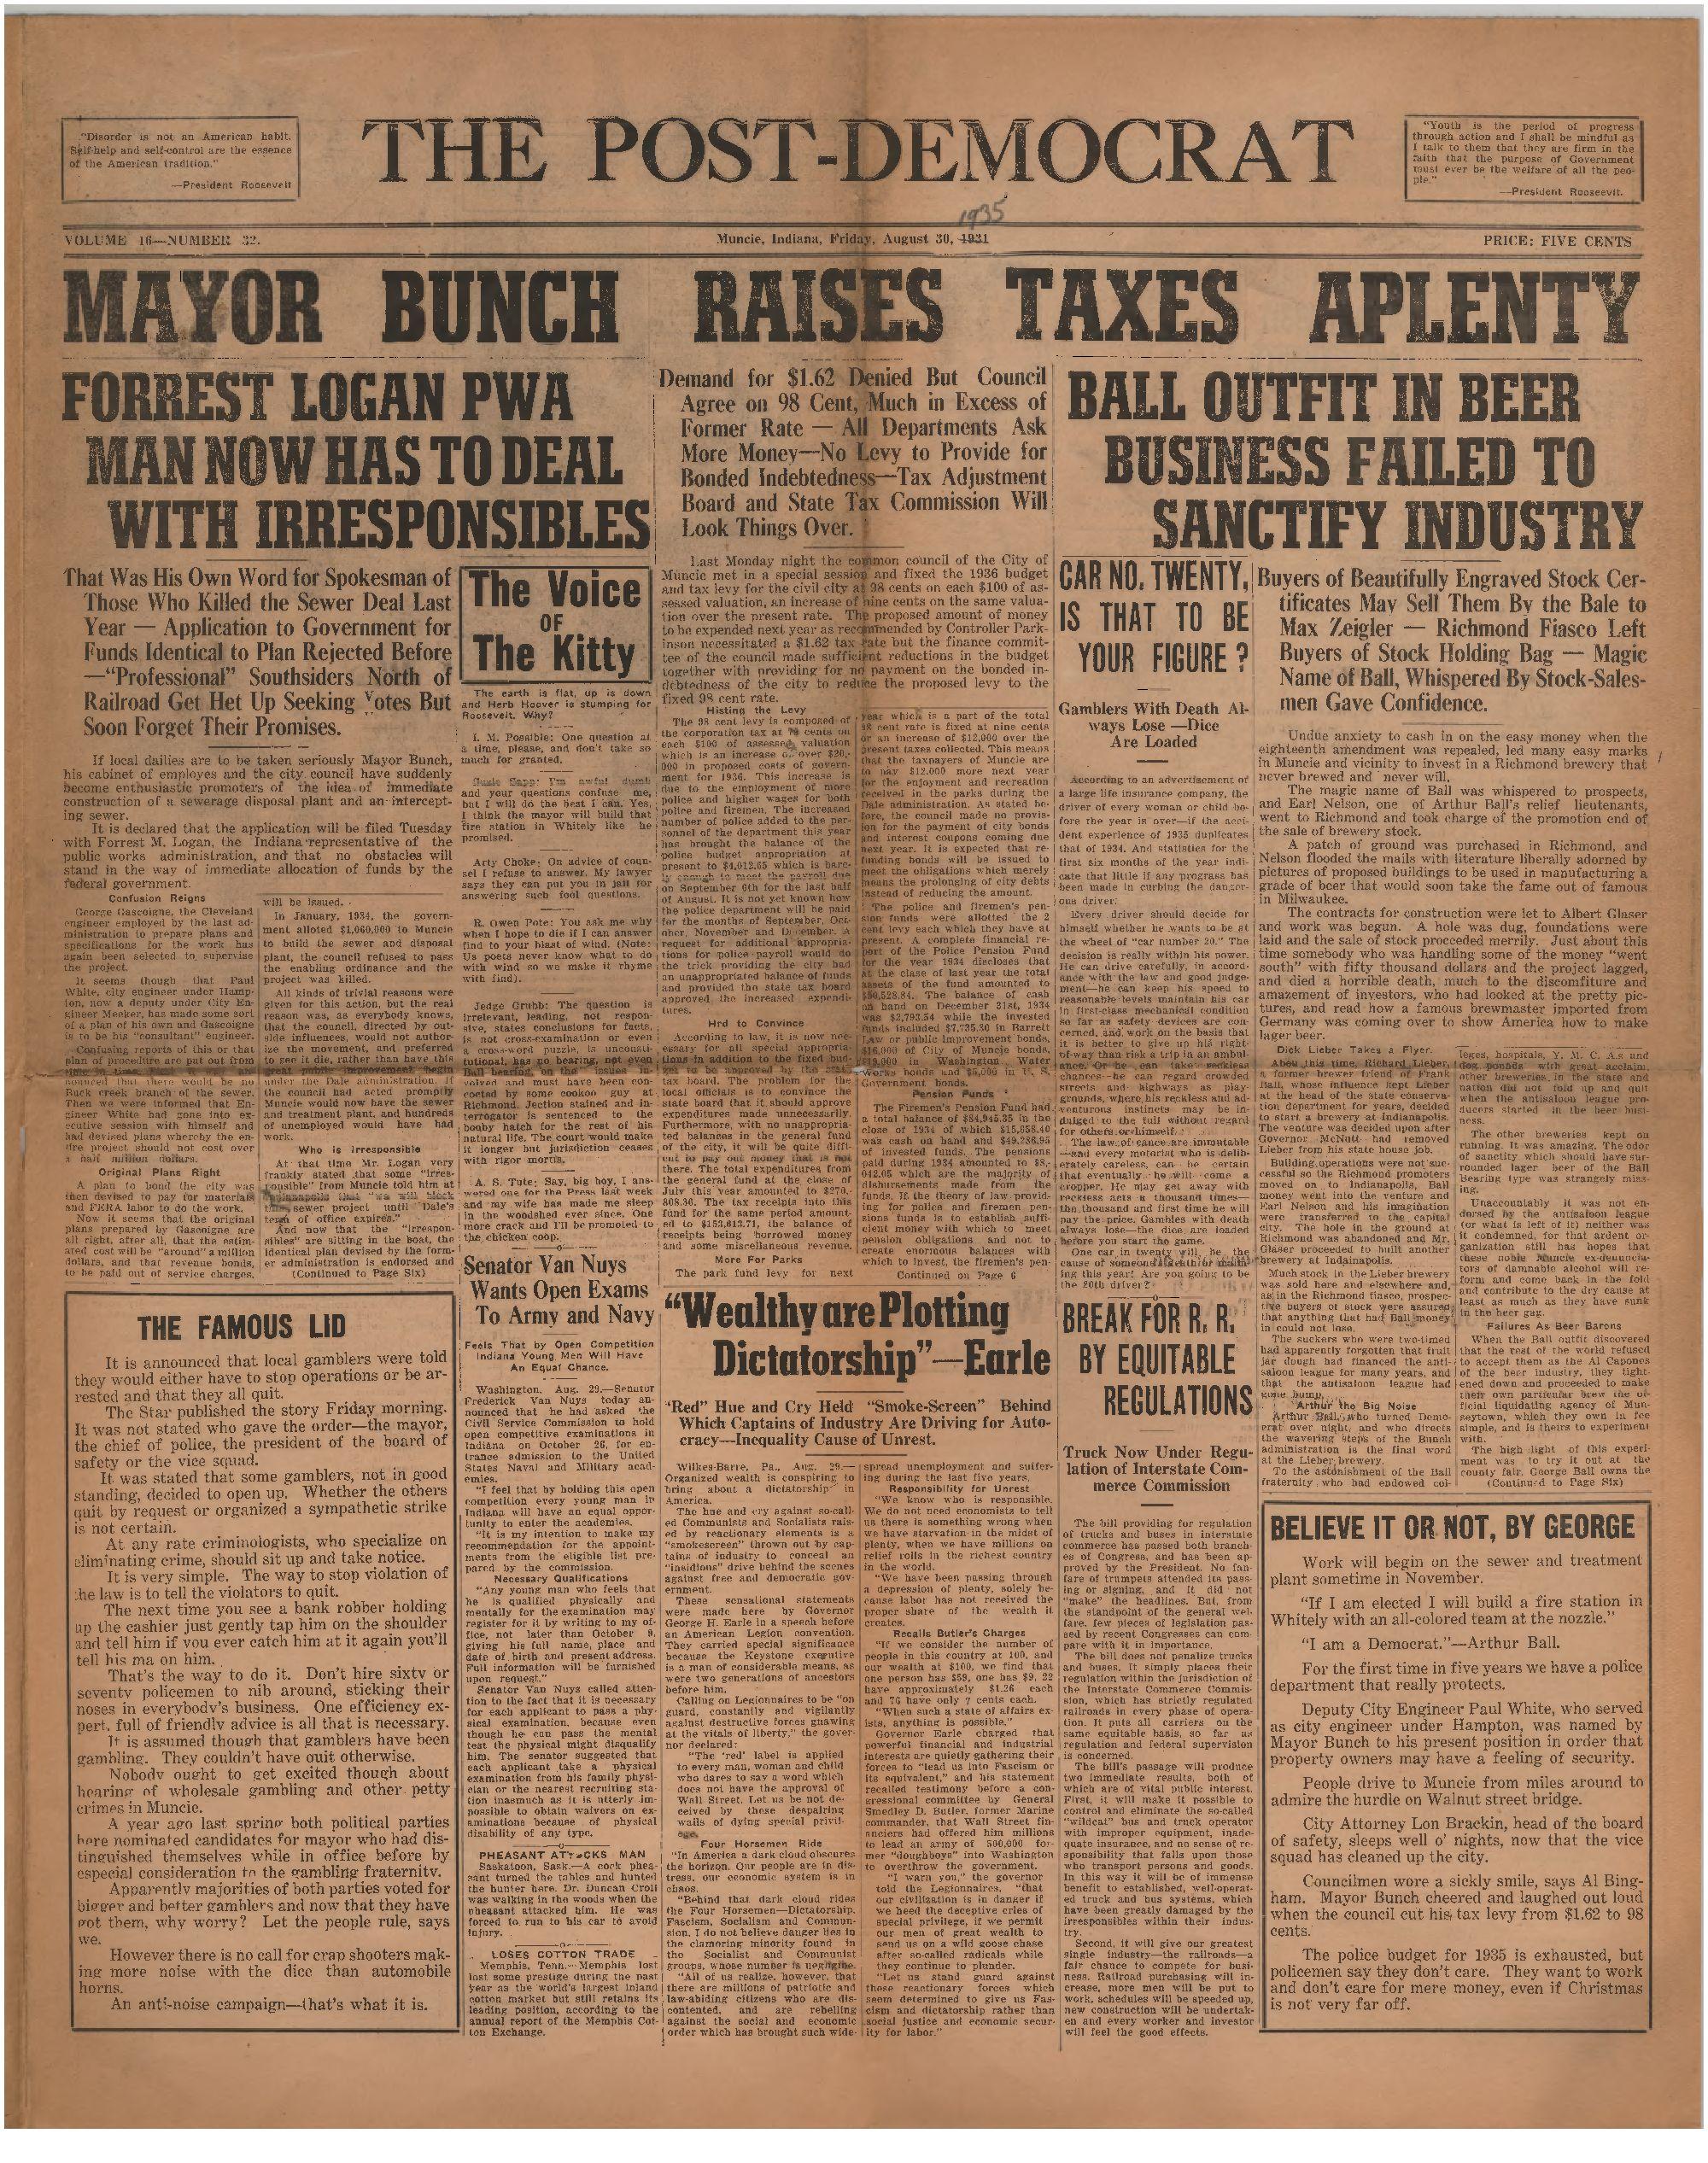 Hawaii Business Magazine Post Democrat Muncie Ind 1935 08 30 Vol 16 No 32 Muncie